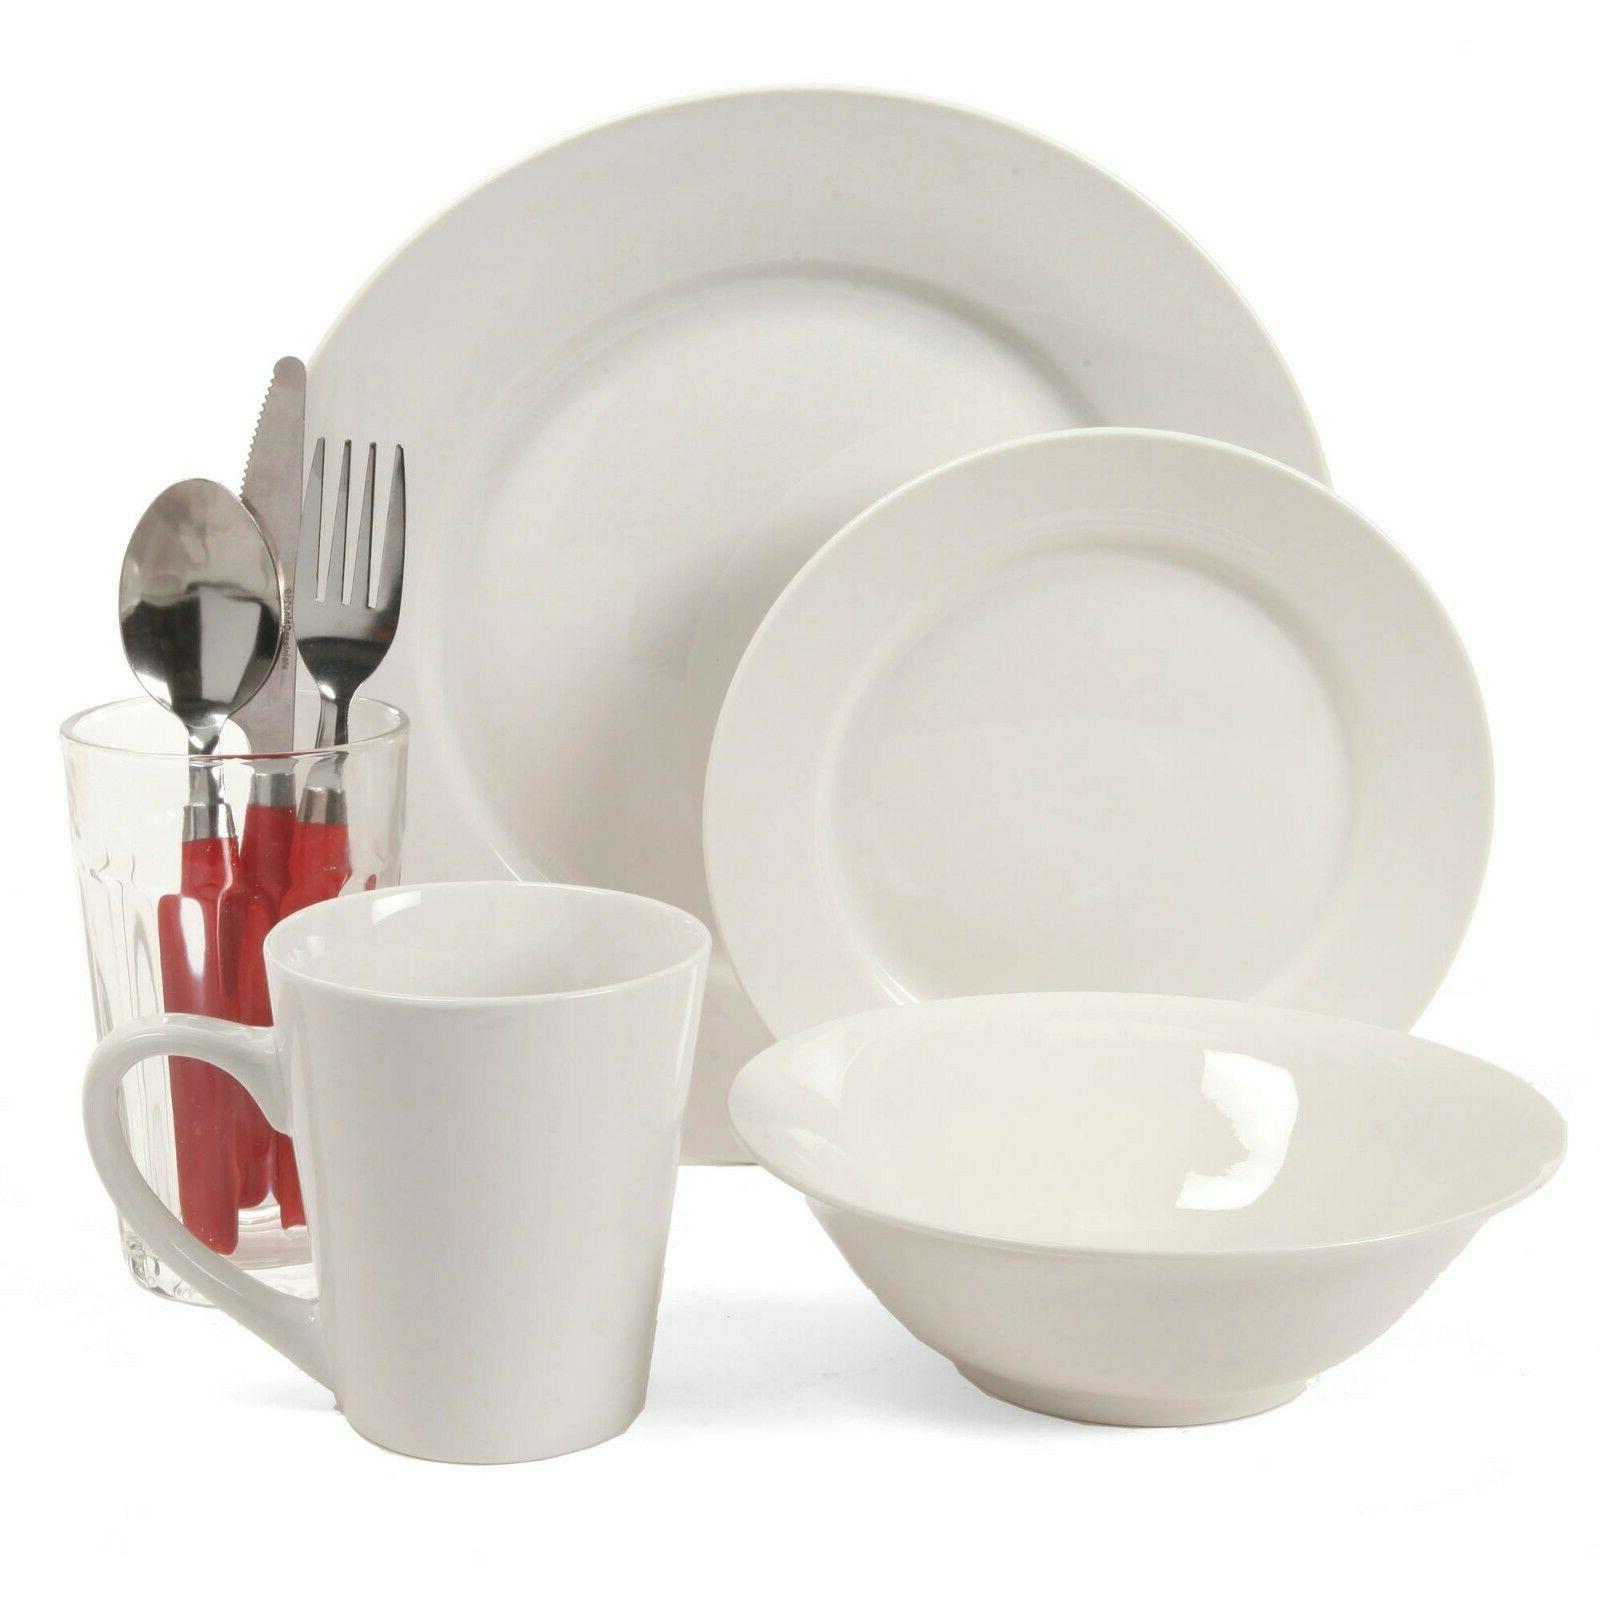 Gibson Home White II 32-Piece Dinnerware Set, White